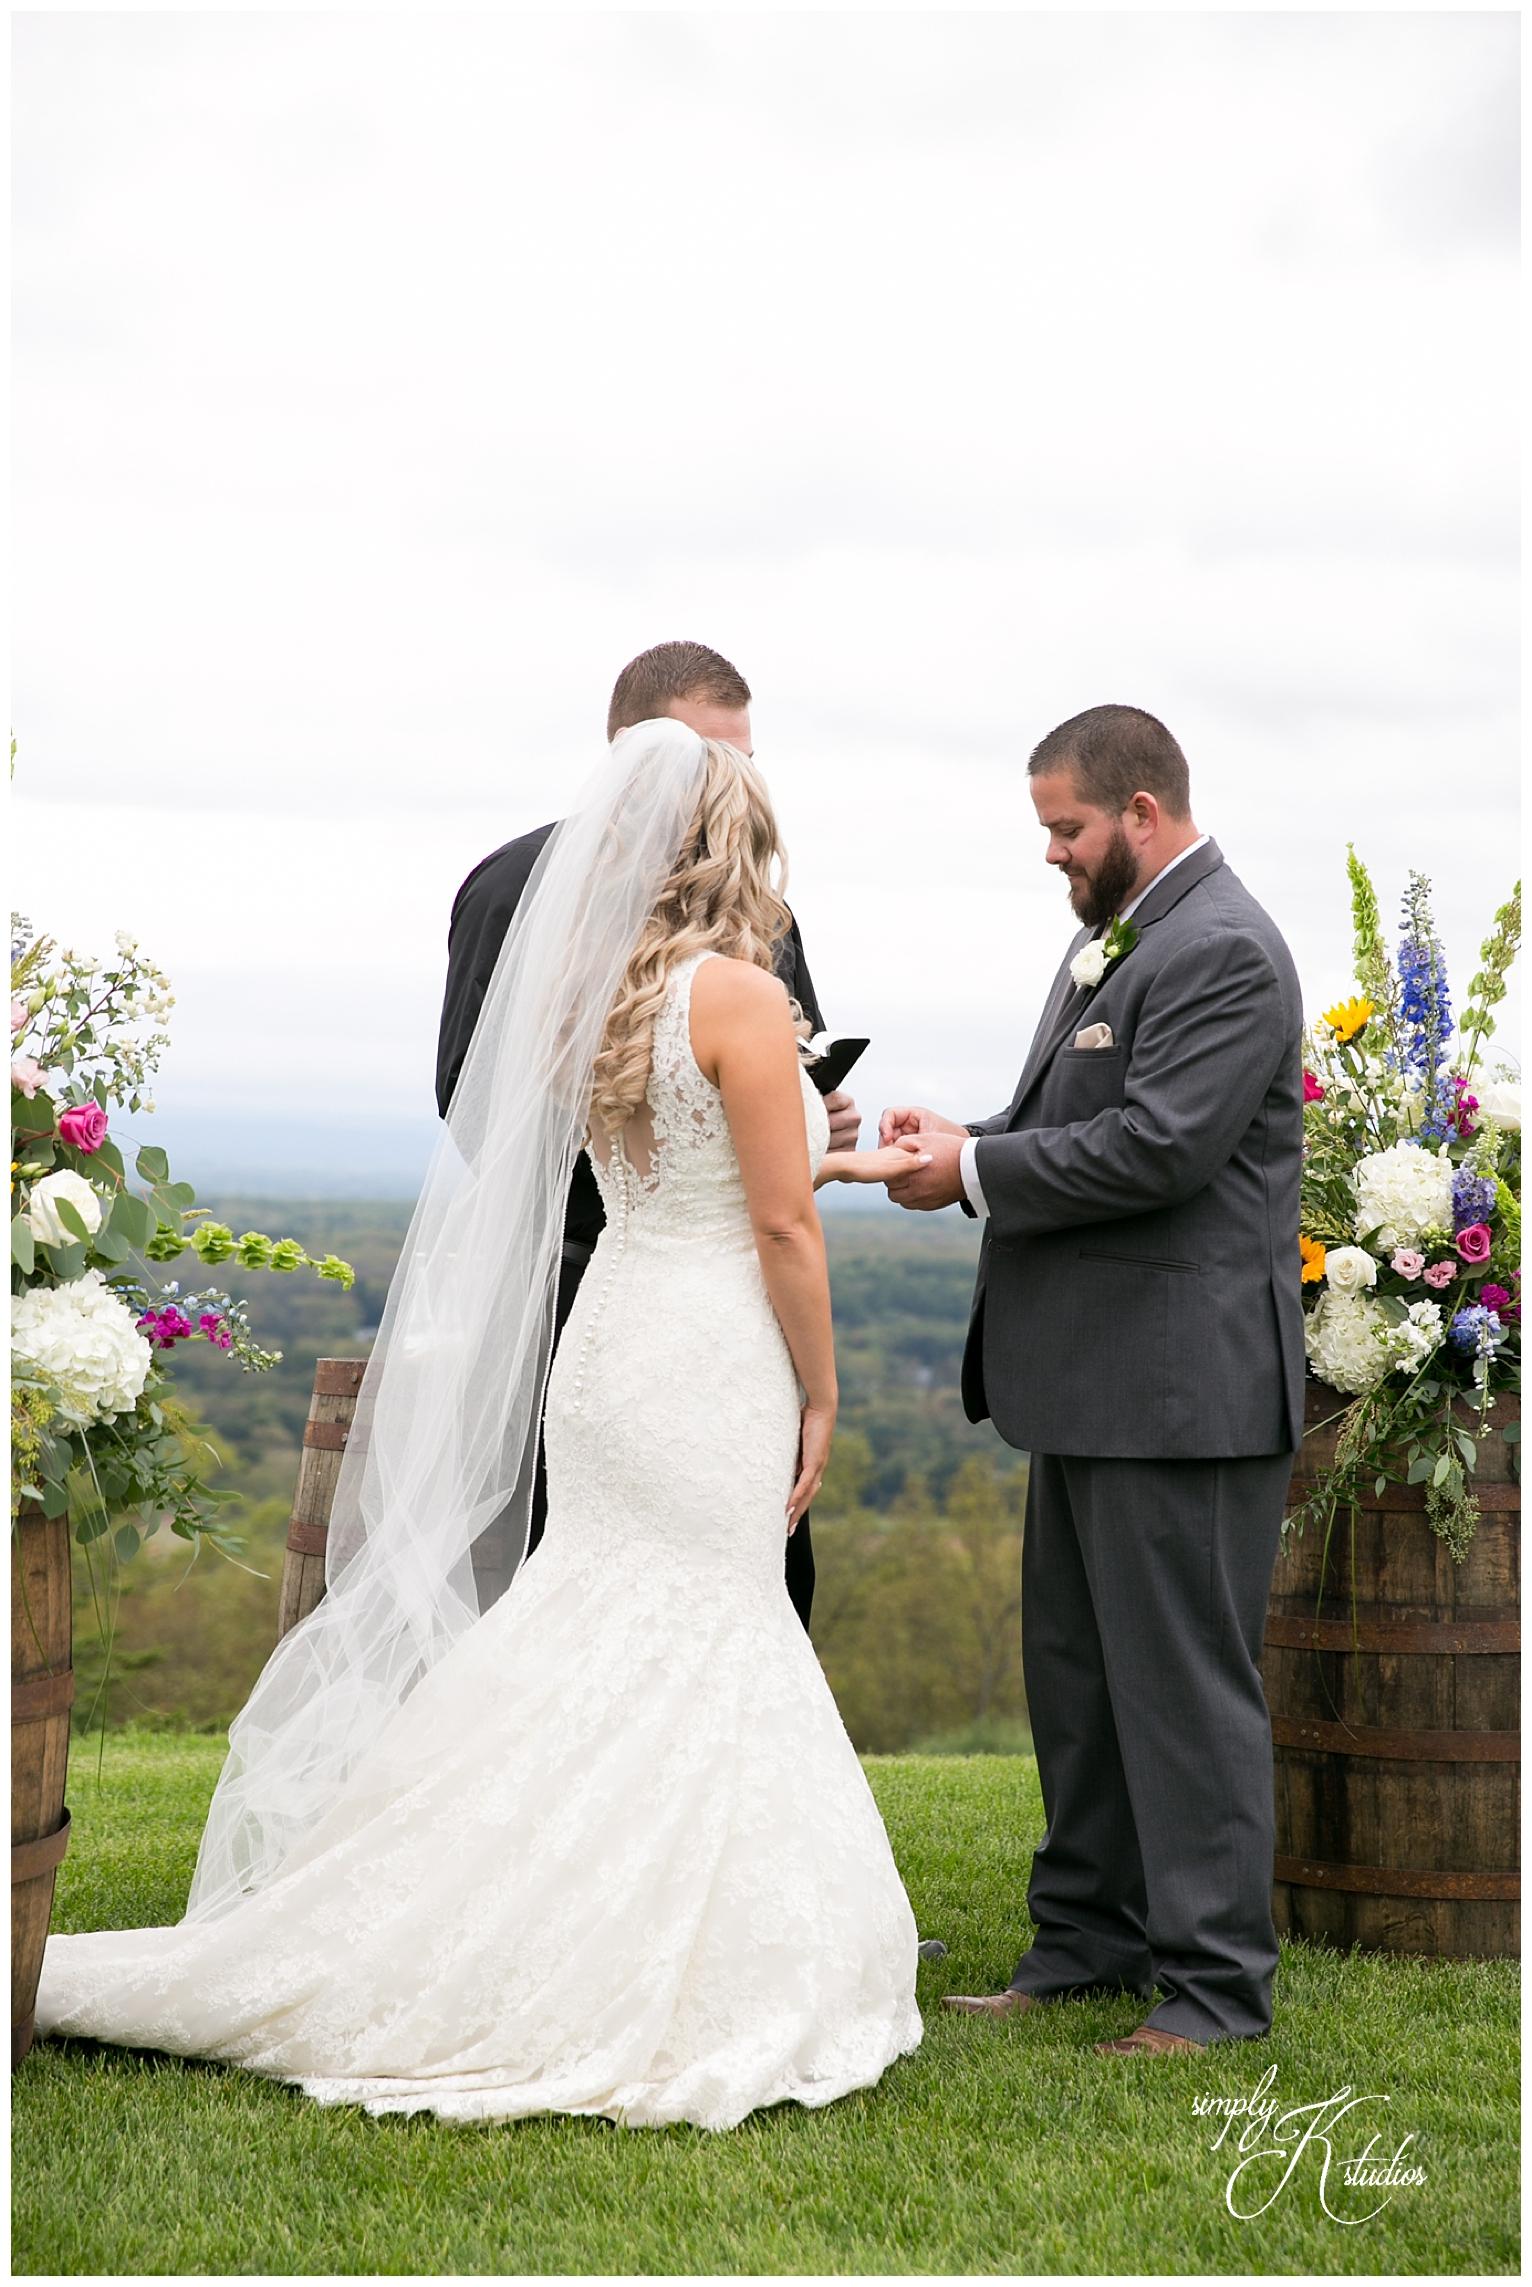 Wedding Photos in Connecticut.jpg